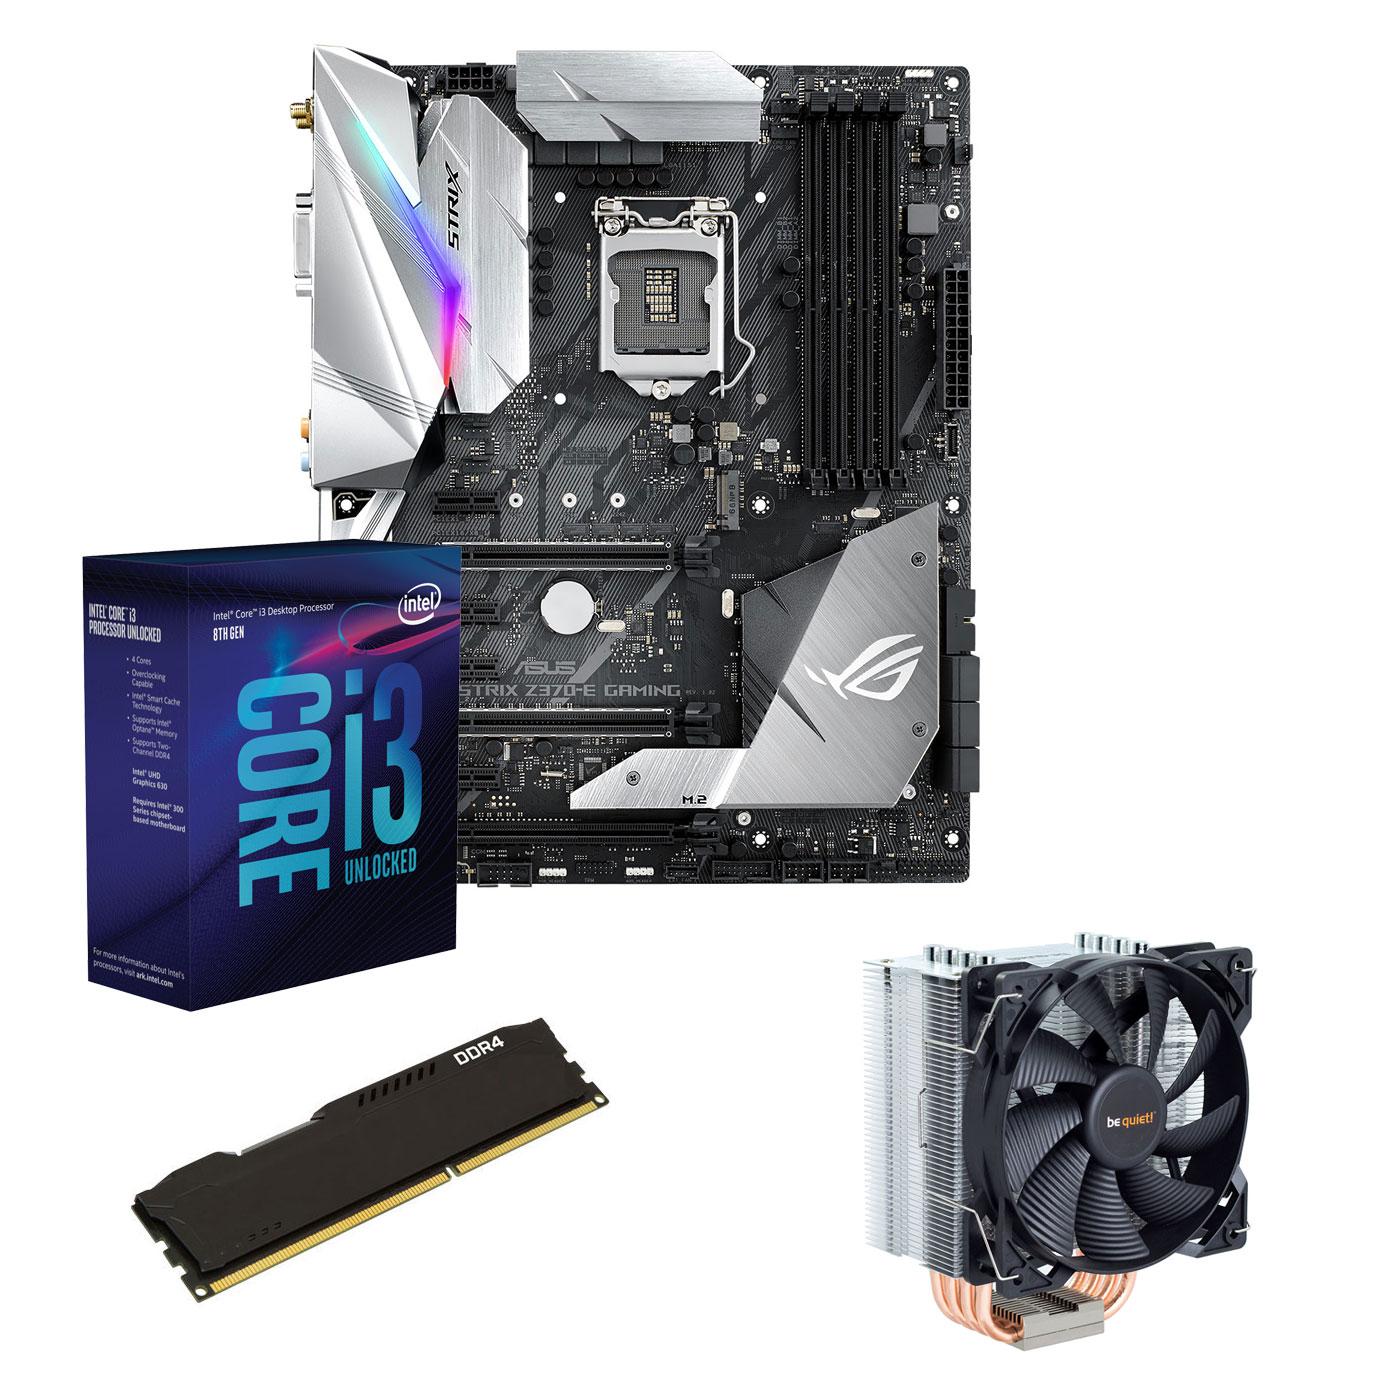 Kit upgrade PC Kit Upgrade PC Core i3K ASUS ROG STRIX Z370E GAMING 4 Go Carte mère Socket 1151 Intel Z370 Express + CPU Intel Core i3-8350K (4.0 GHz) + RAM 4 Go DDR4